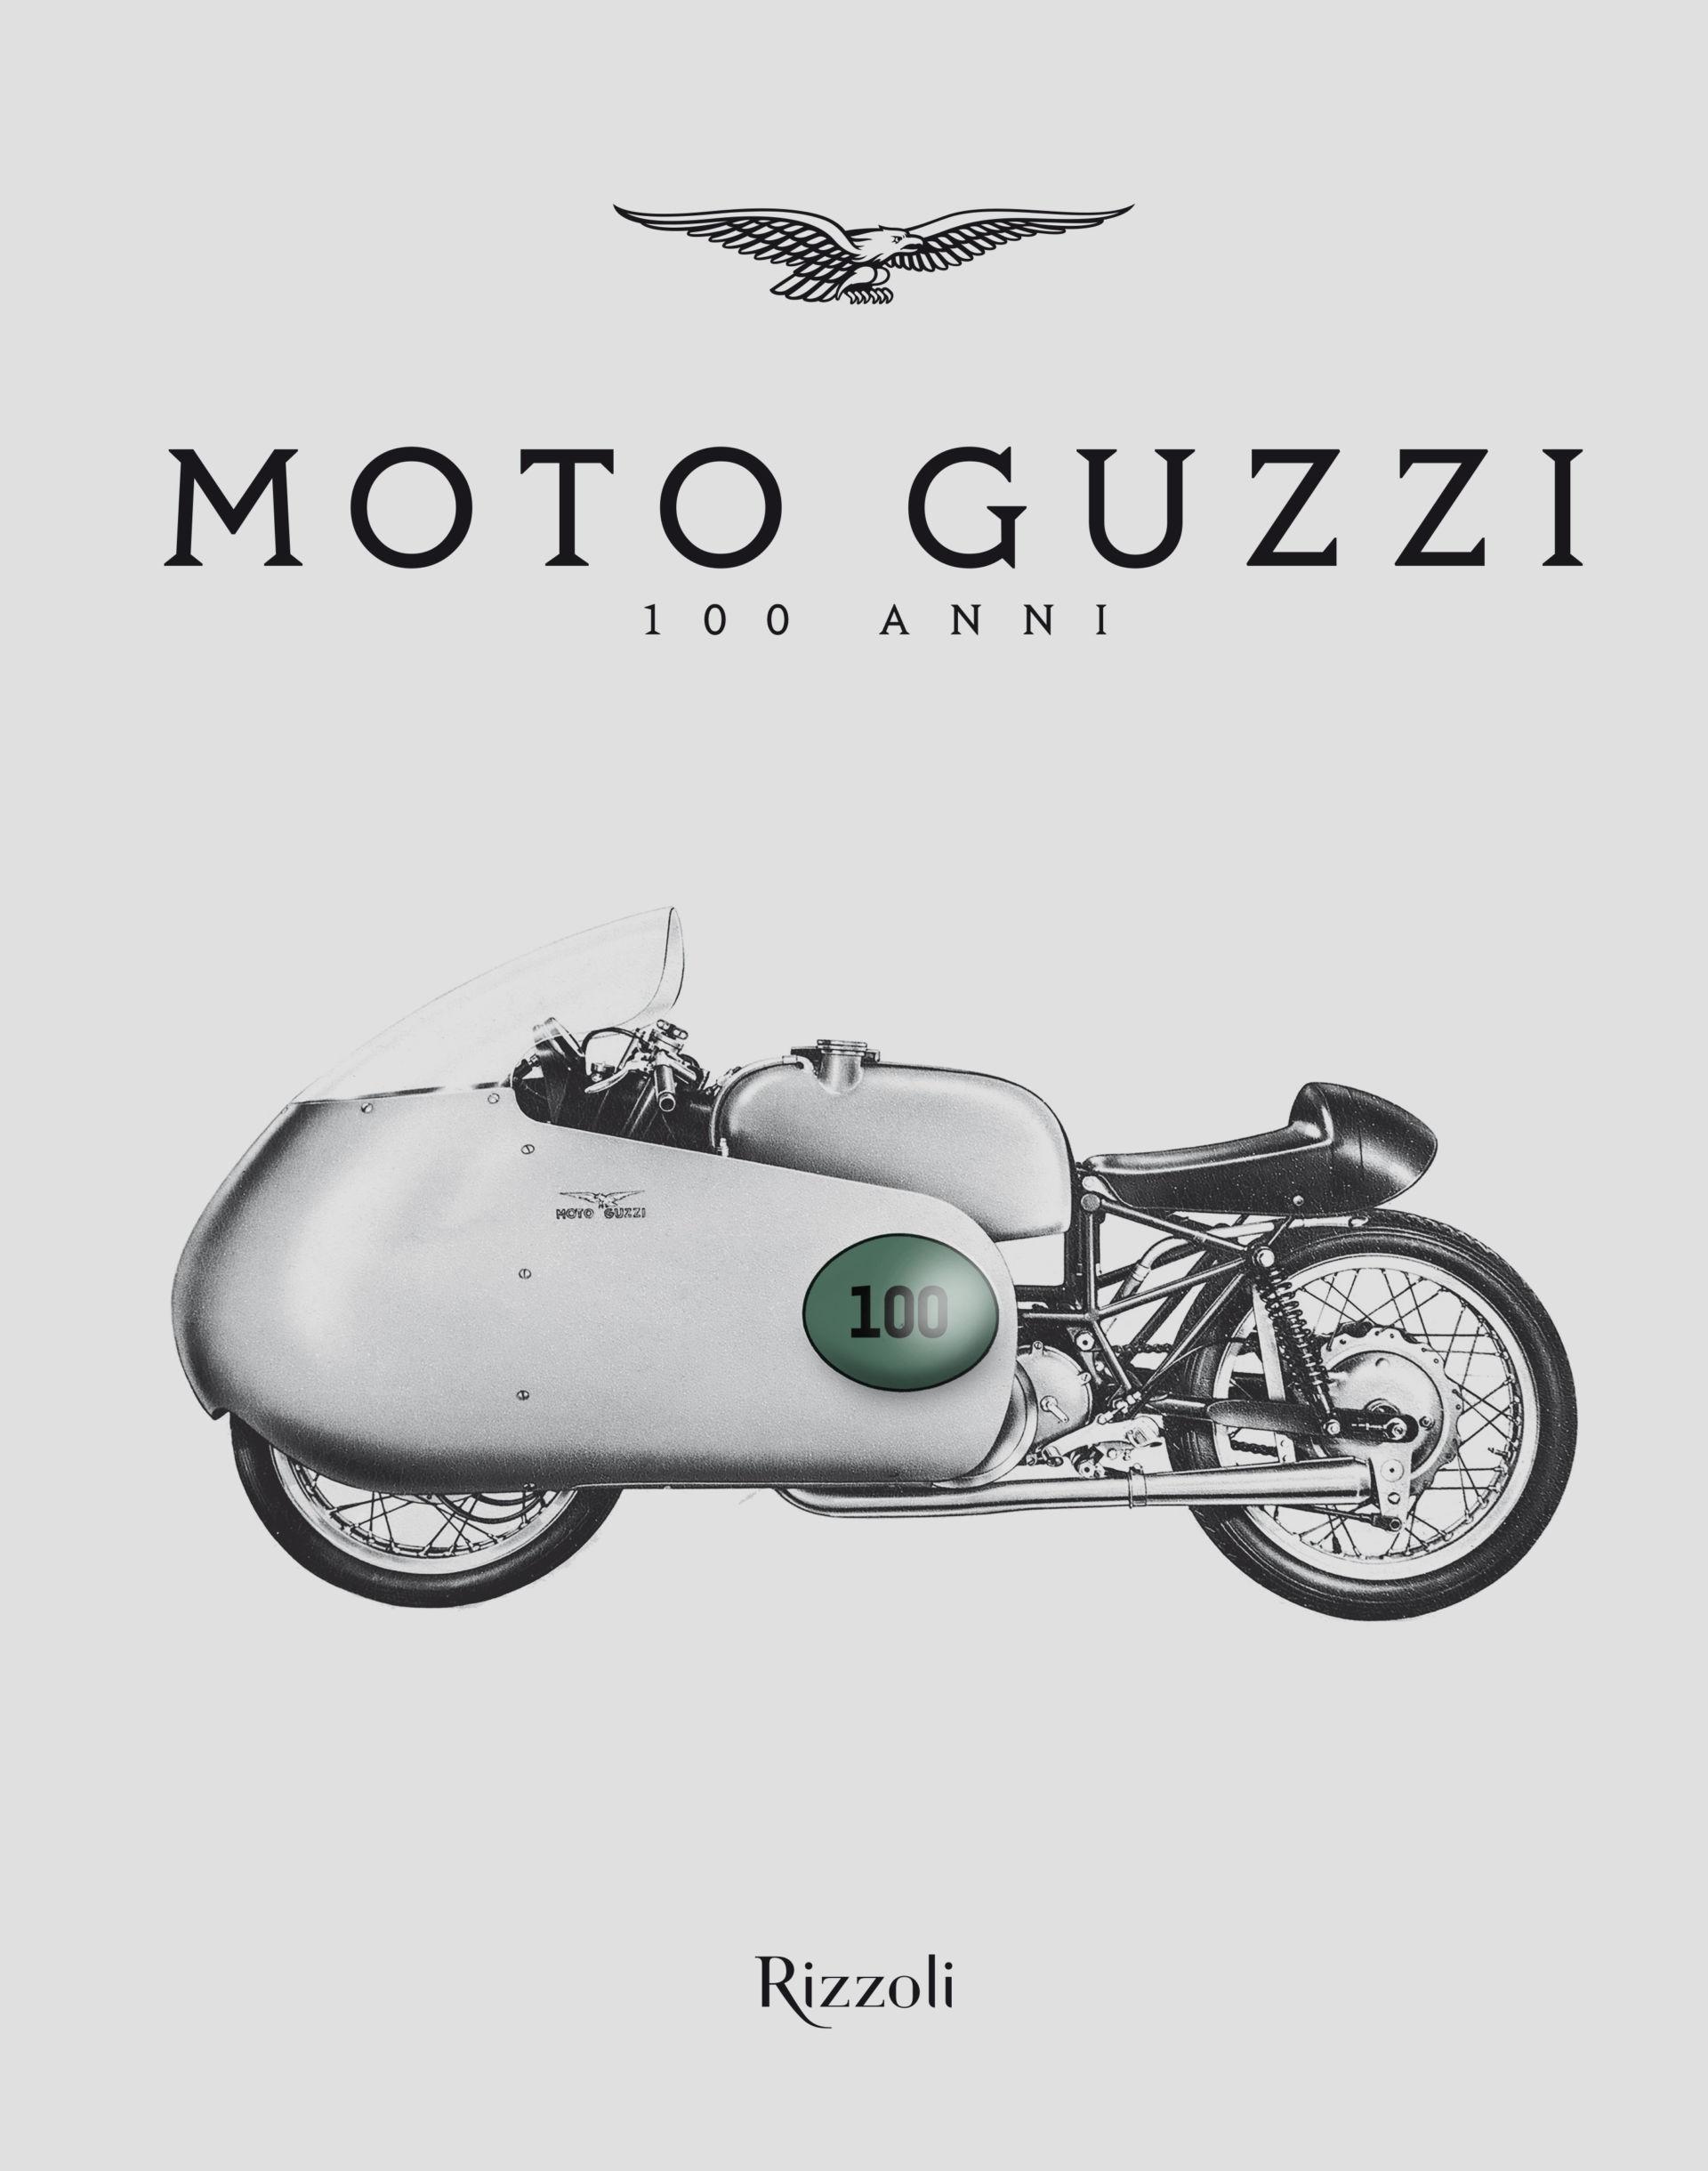 The cover of Moto Guzzi 100 Anni, a book about the 100-year history of Moto Guzzi. Photo courtesy Piaggi Group.